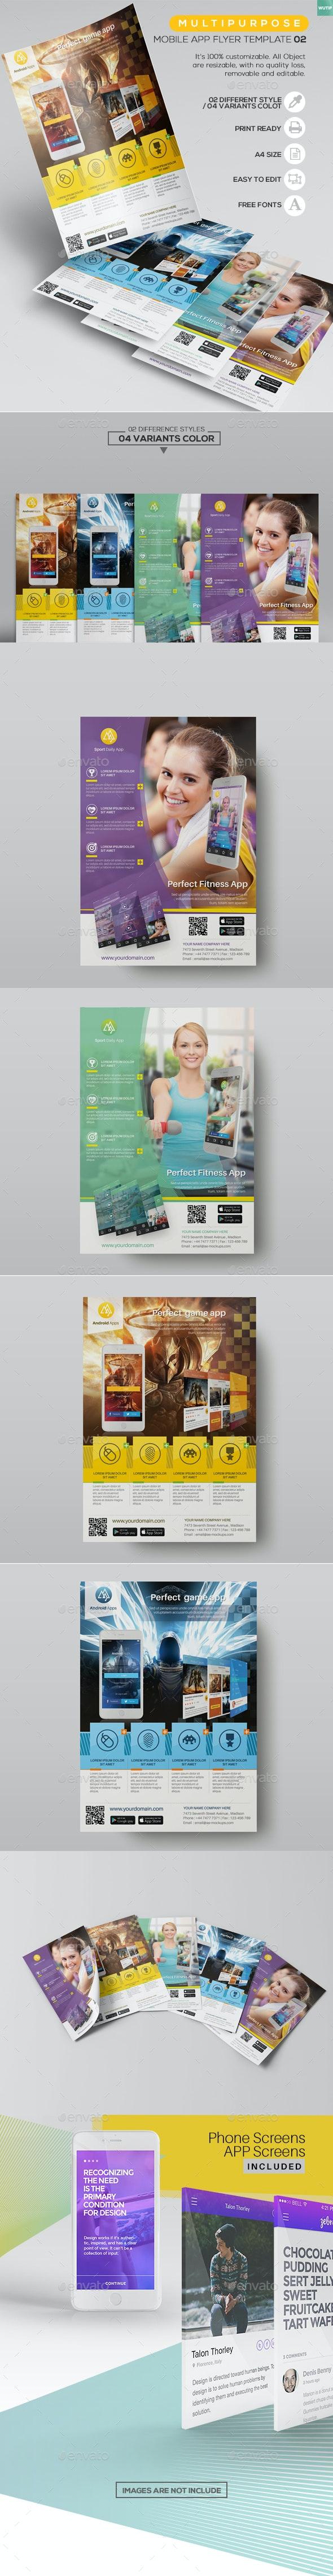 Multipurpose - Mobile App Flyer Template 02 - Commerce Flyers